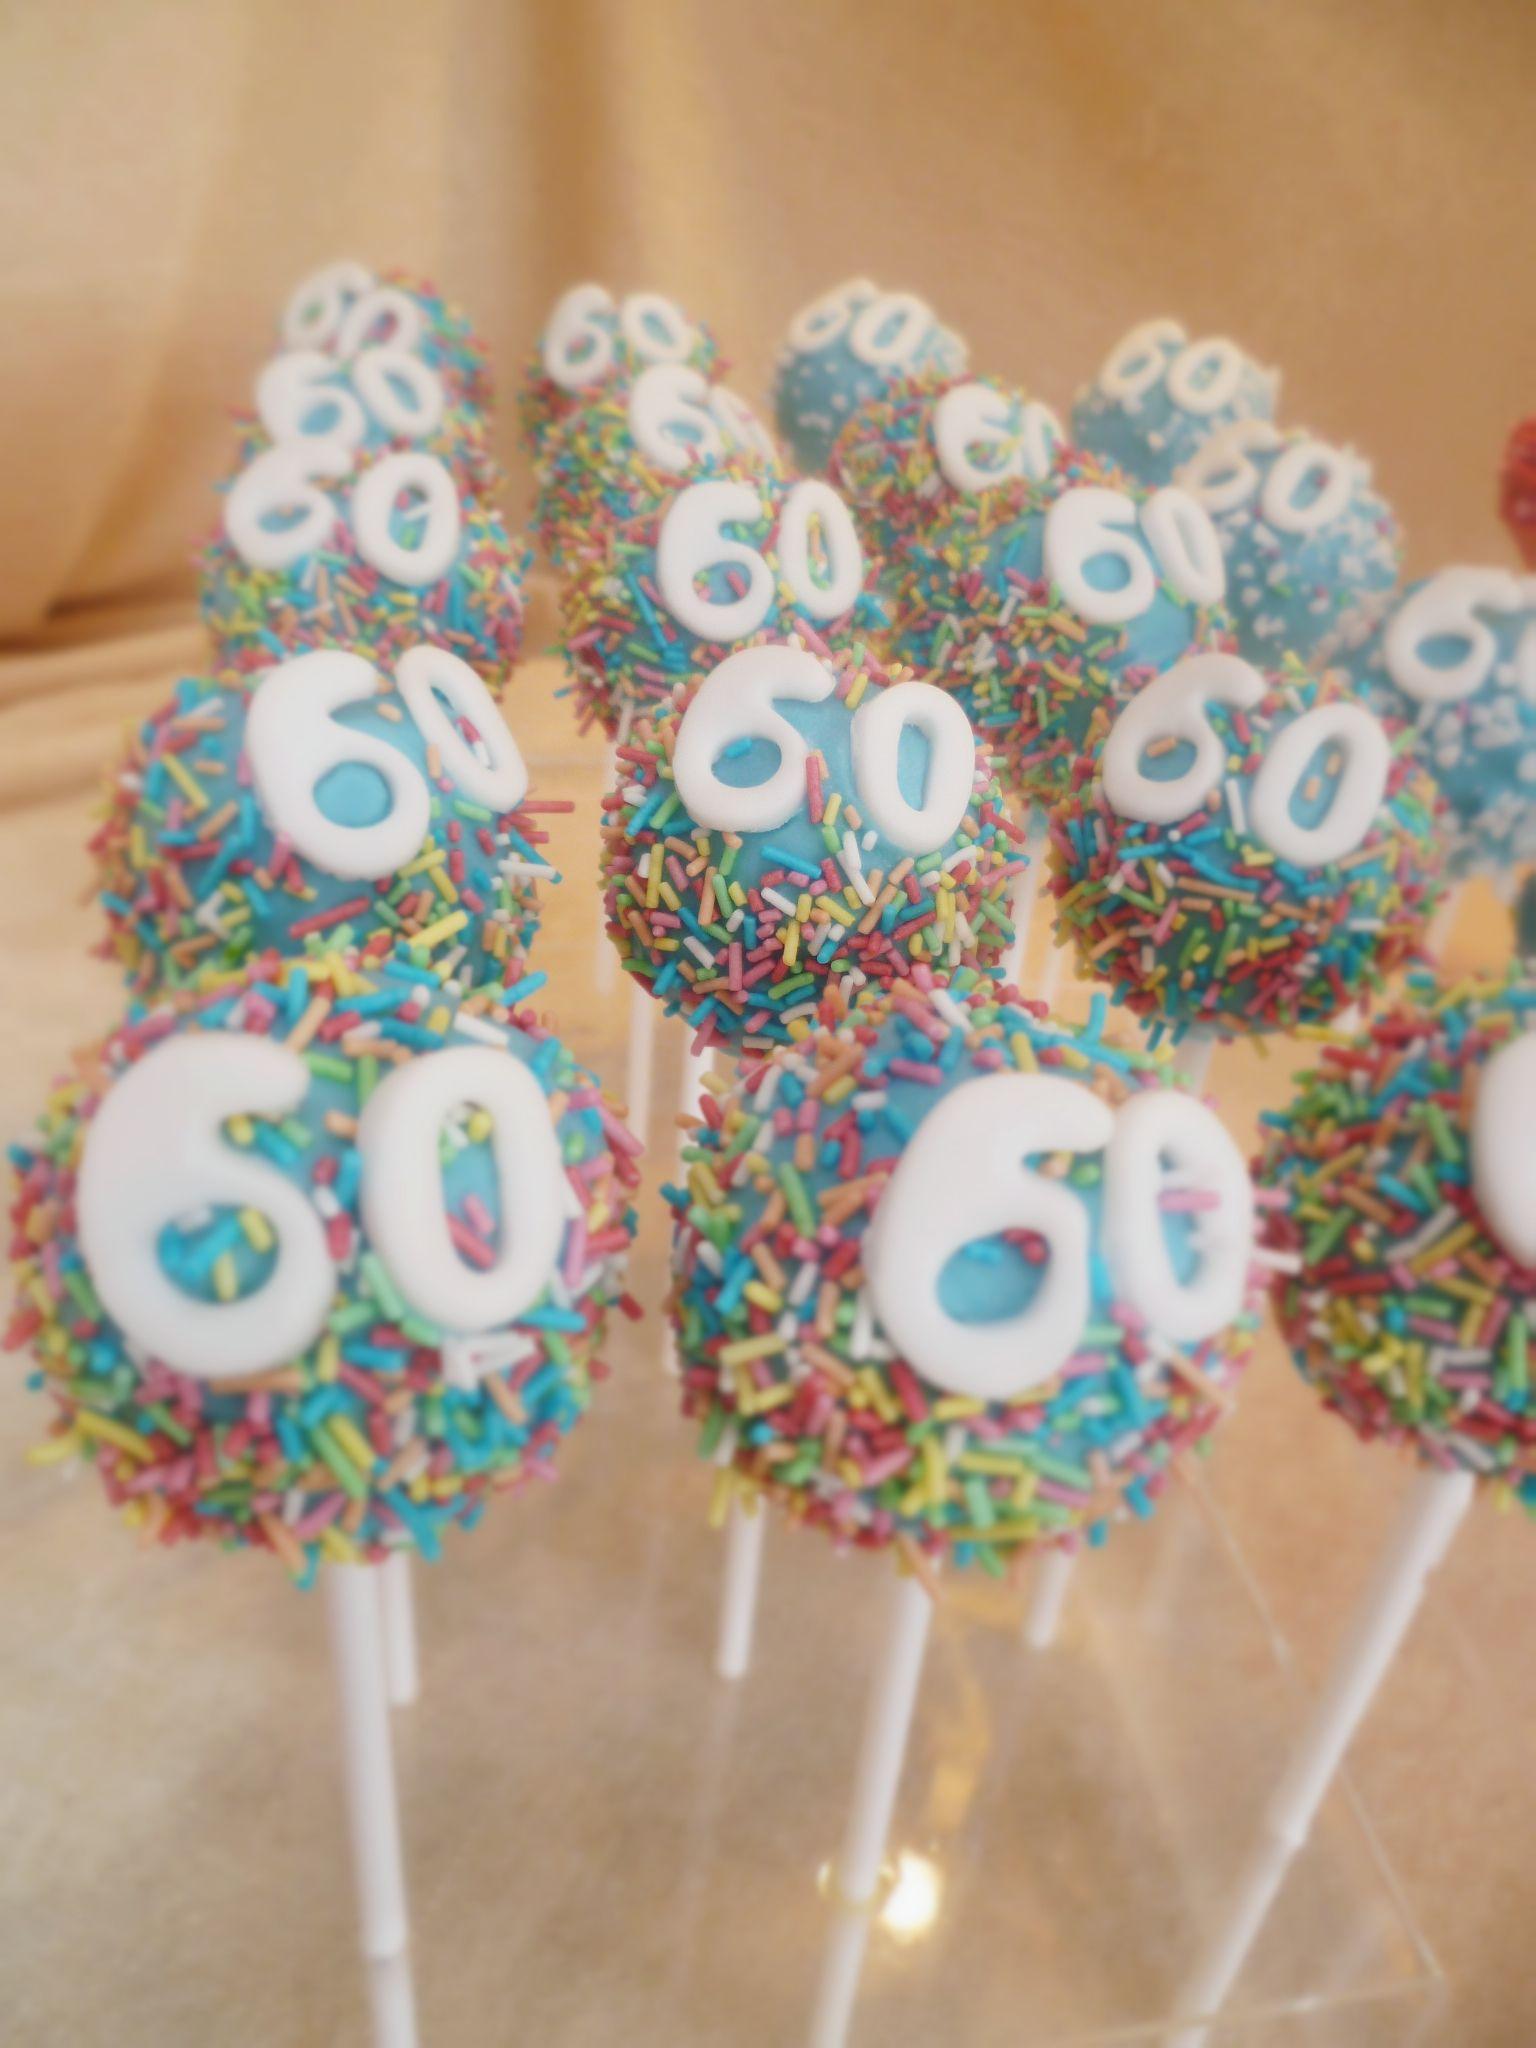 60th Birthday Cake Pops Make That Birthday A Bit More